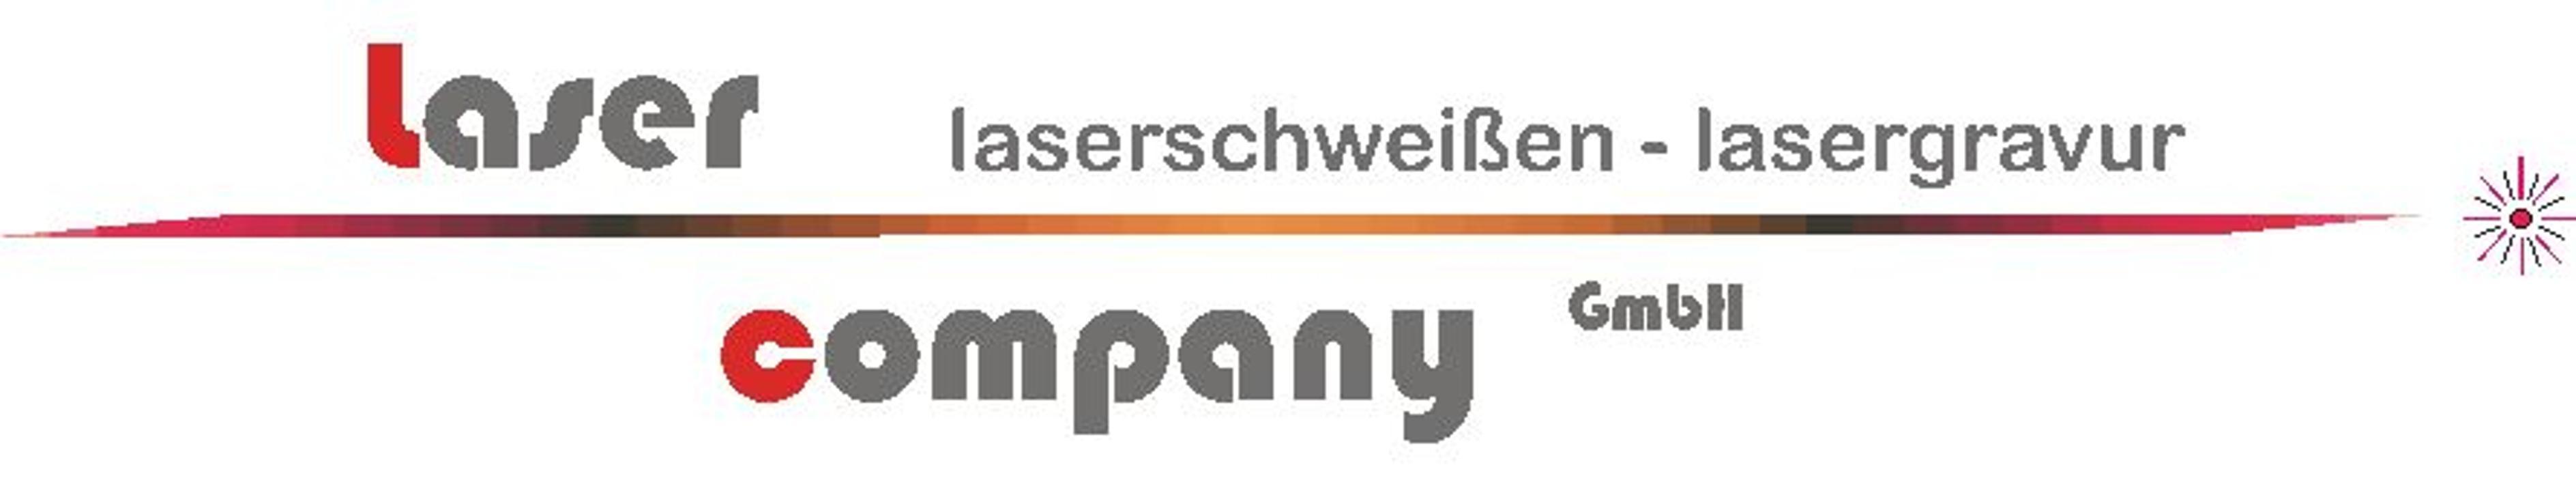 Bild zu laser company GmbH in Nürtingen